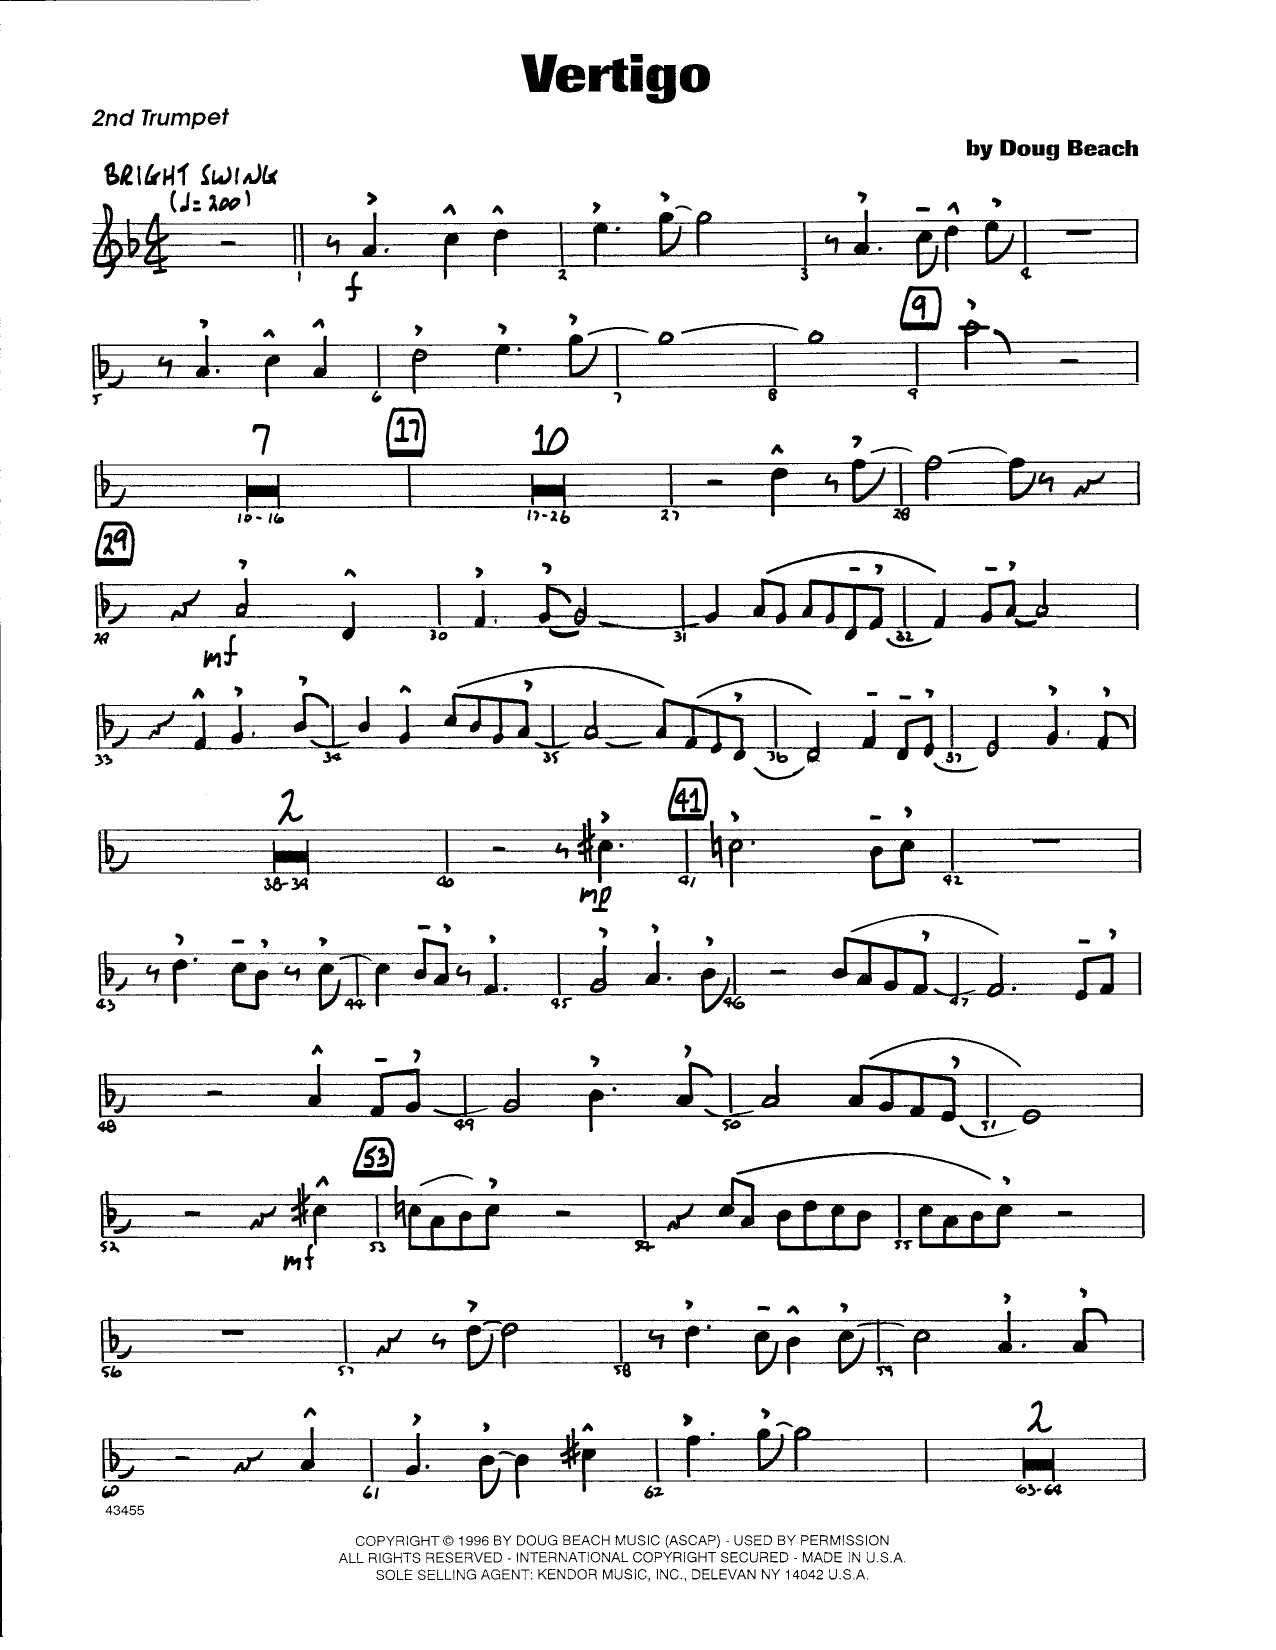 Doug Beach Vertigo - 2nd Bb Trumpet sheet music notes and chords. Download Printable PDF.